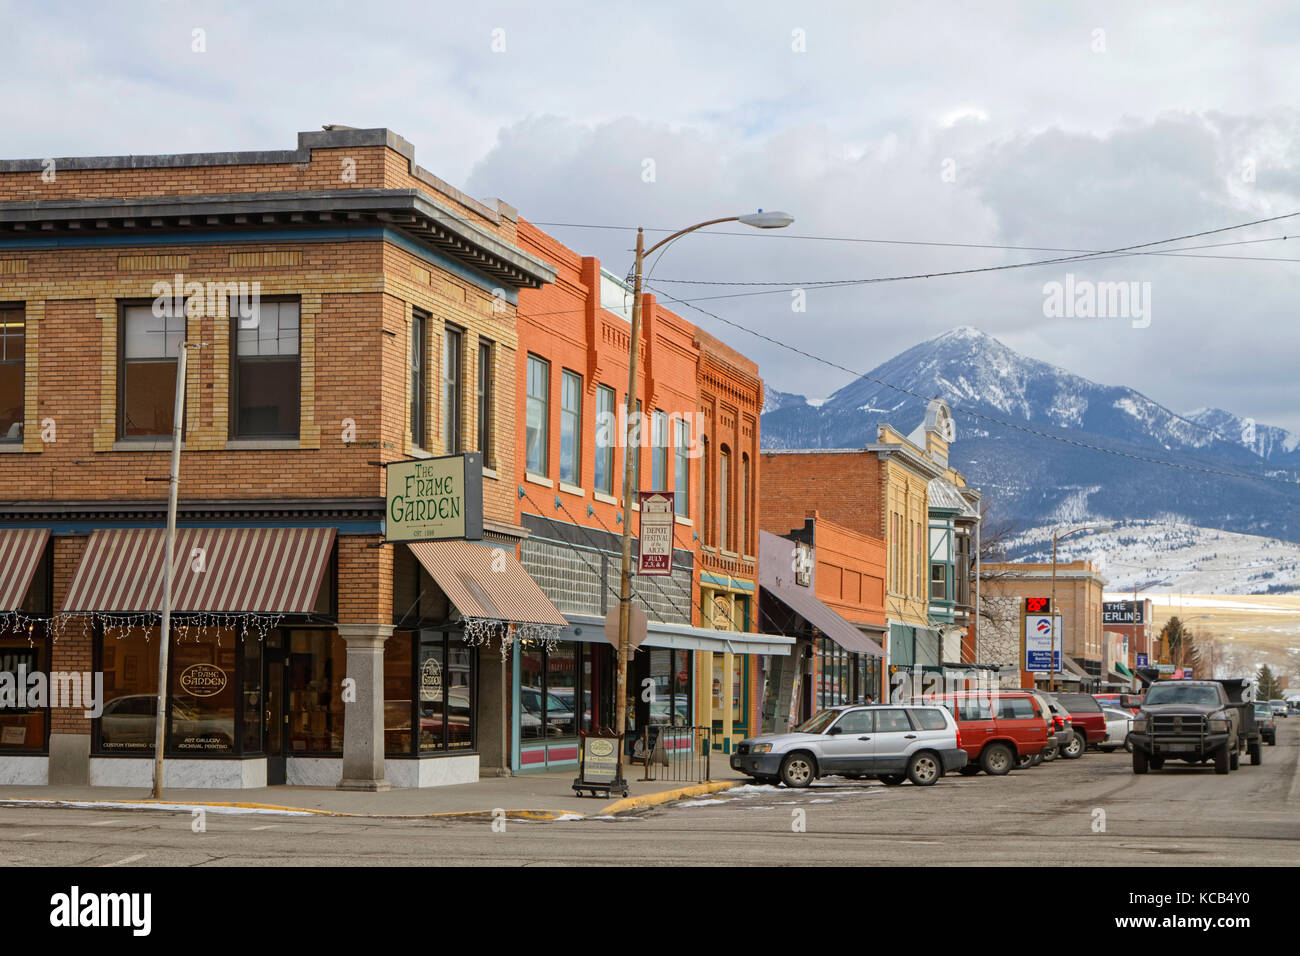 LIVINGSTON, MONTANA, January 25, 2017 : Downtown Livingston. Originally called called Clark City after Heman Clark, - Stock Image